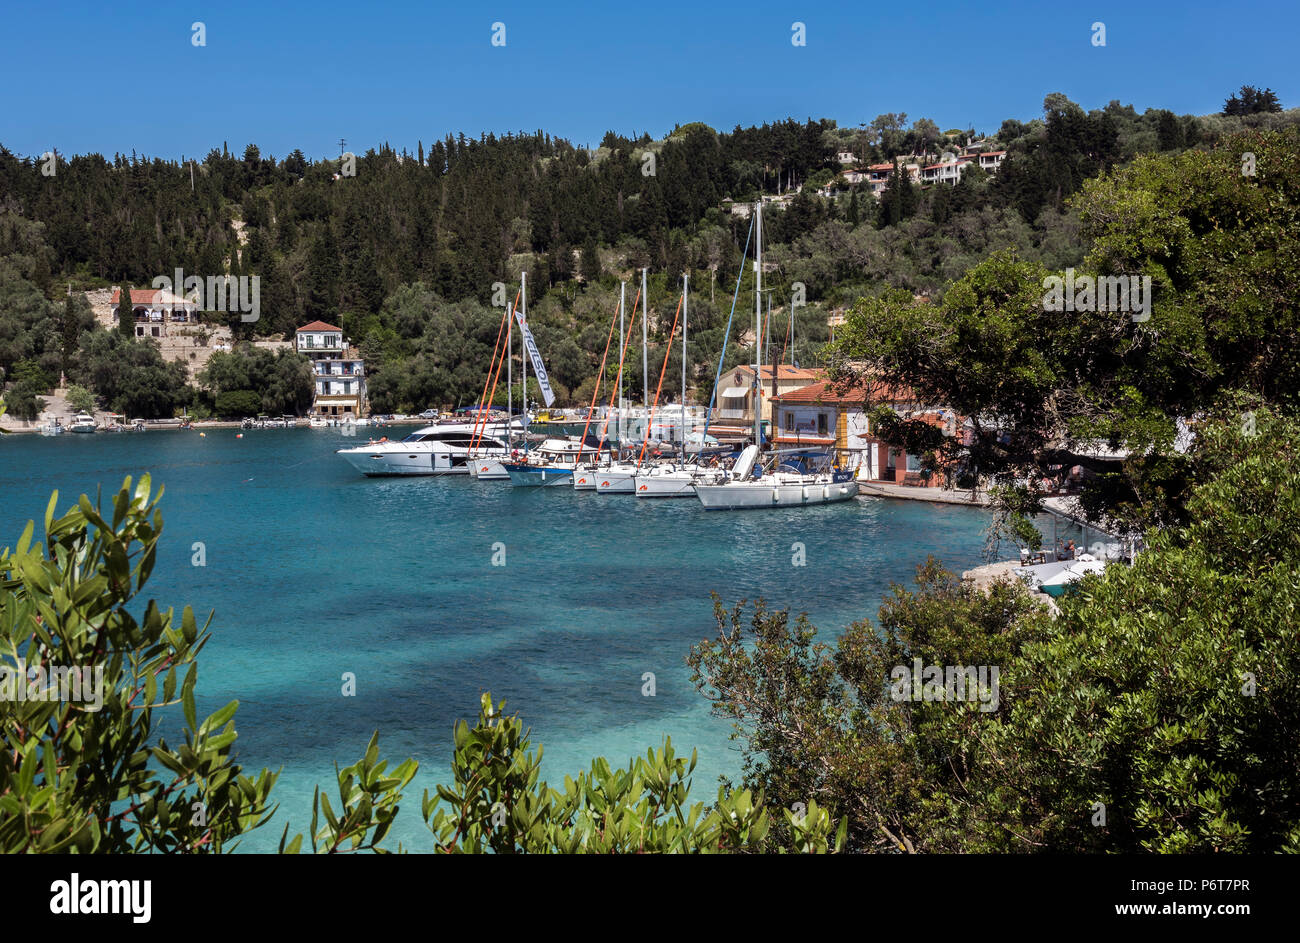 Yachts in Lakka Bay, Paxos. - Stock Image